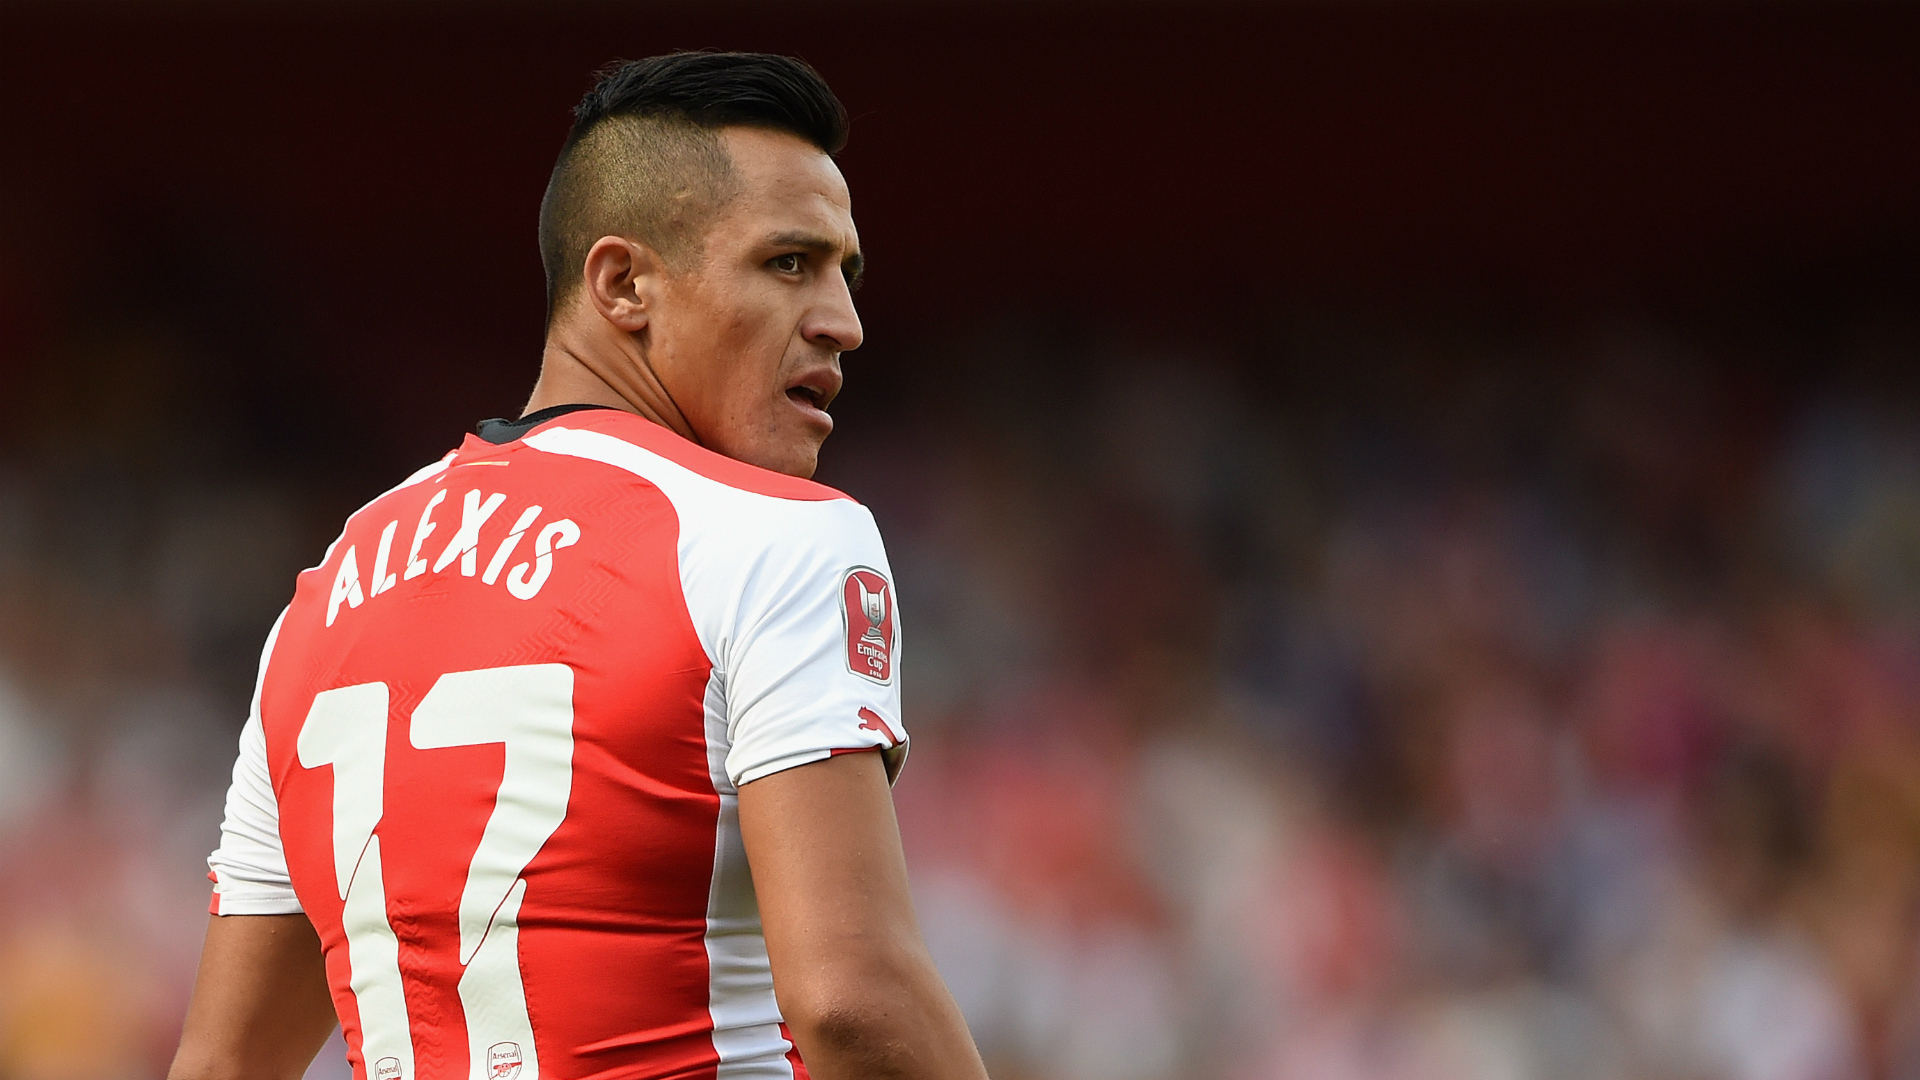 Alexis Sanchez Ingin Pindah ke City